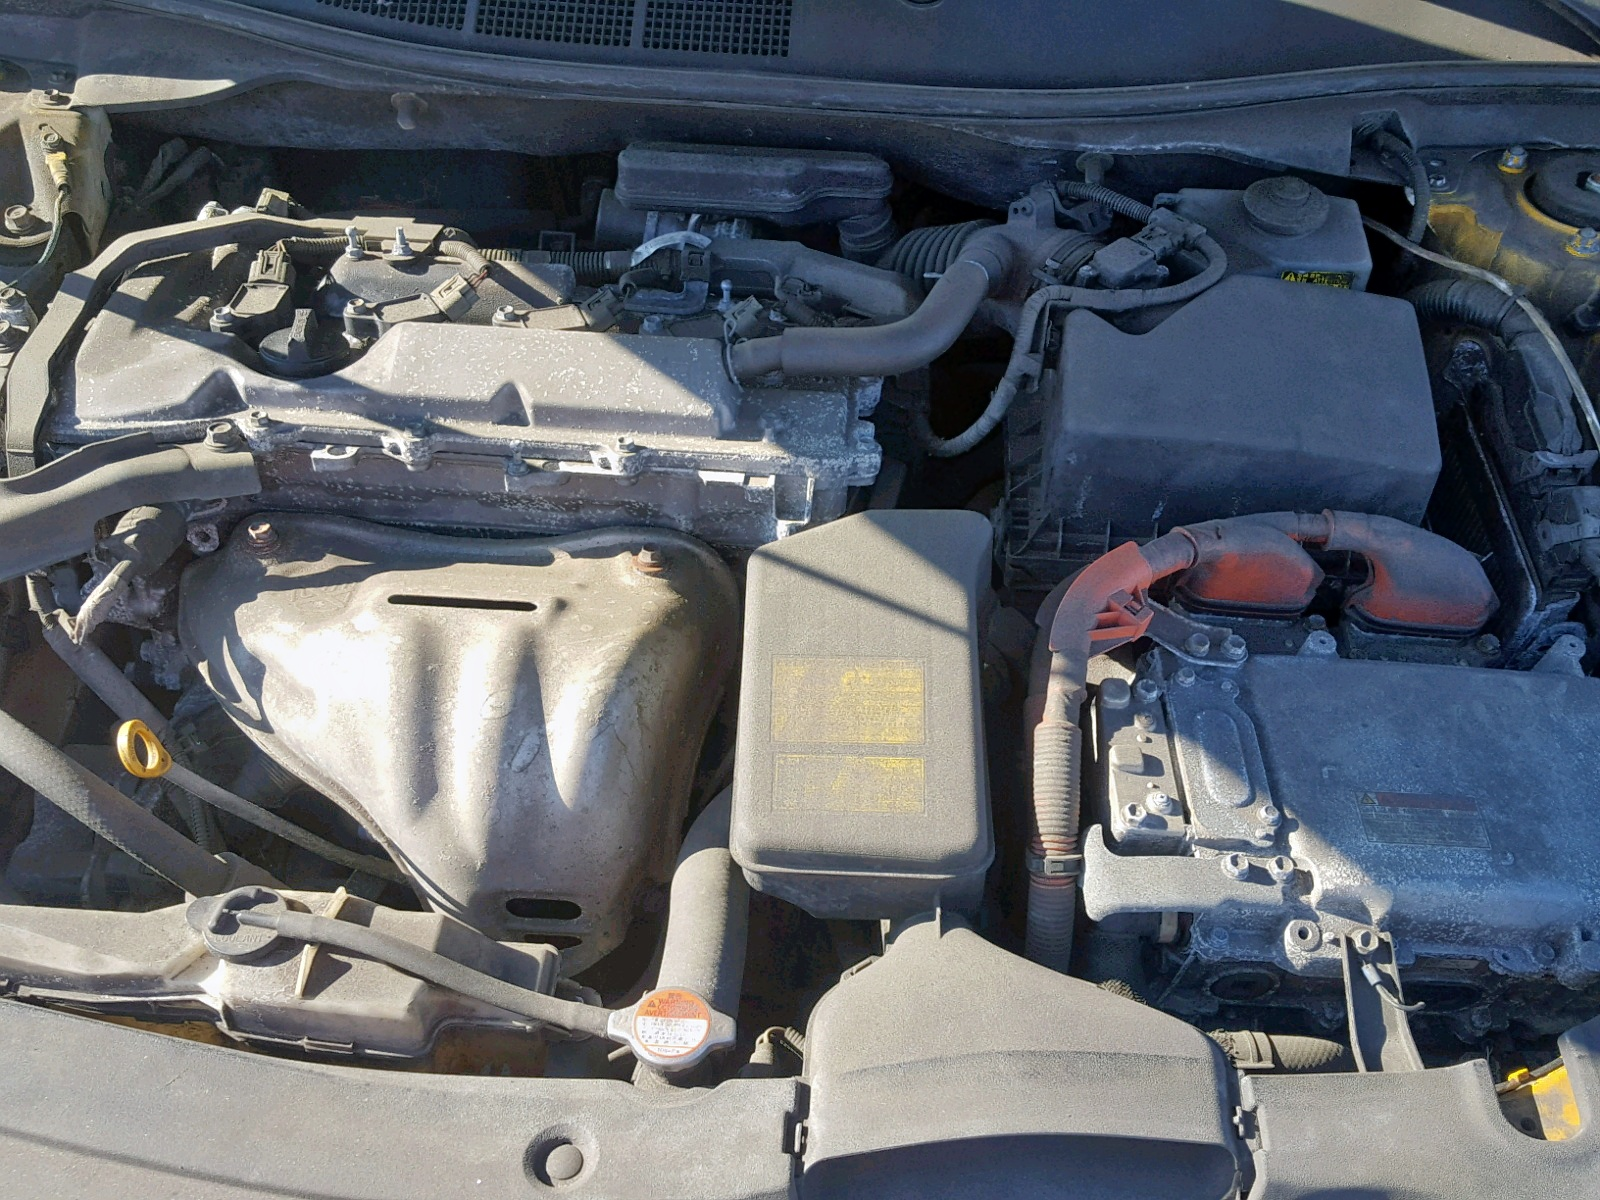 2012 Toyota Camry Hybr 2.5L inside view